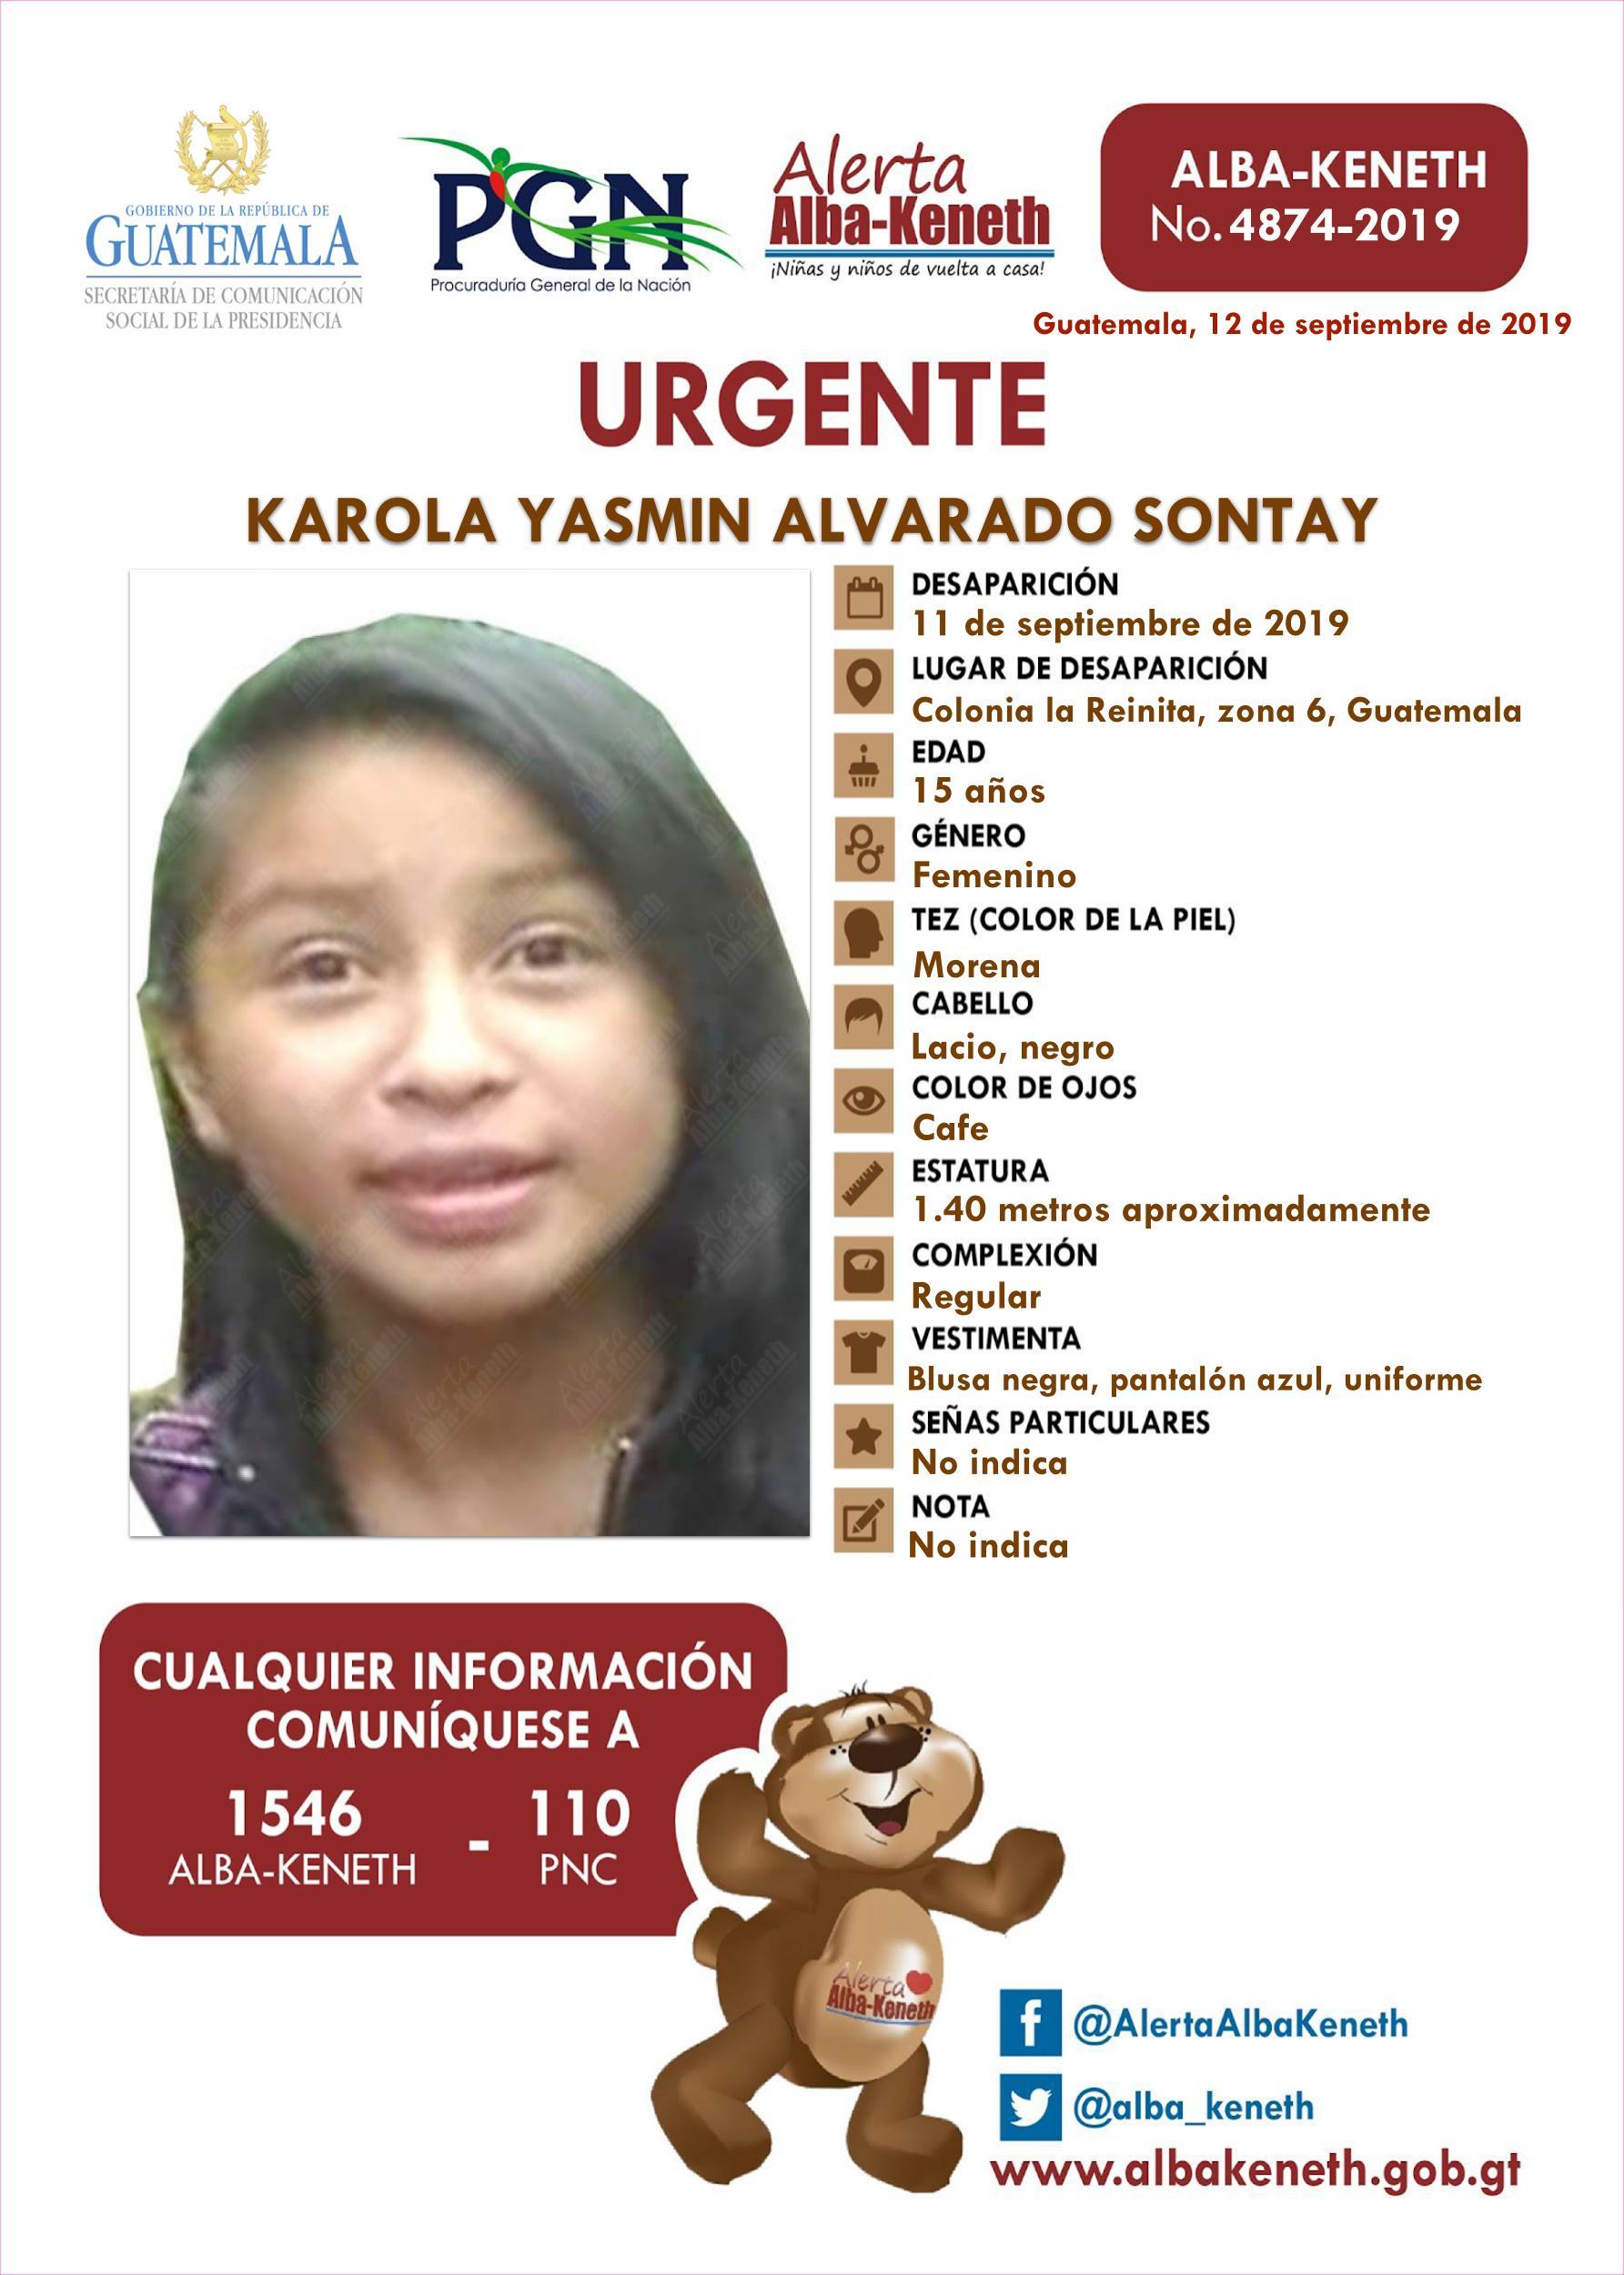 Karola Yasmin Alvarado Sontay